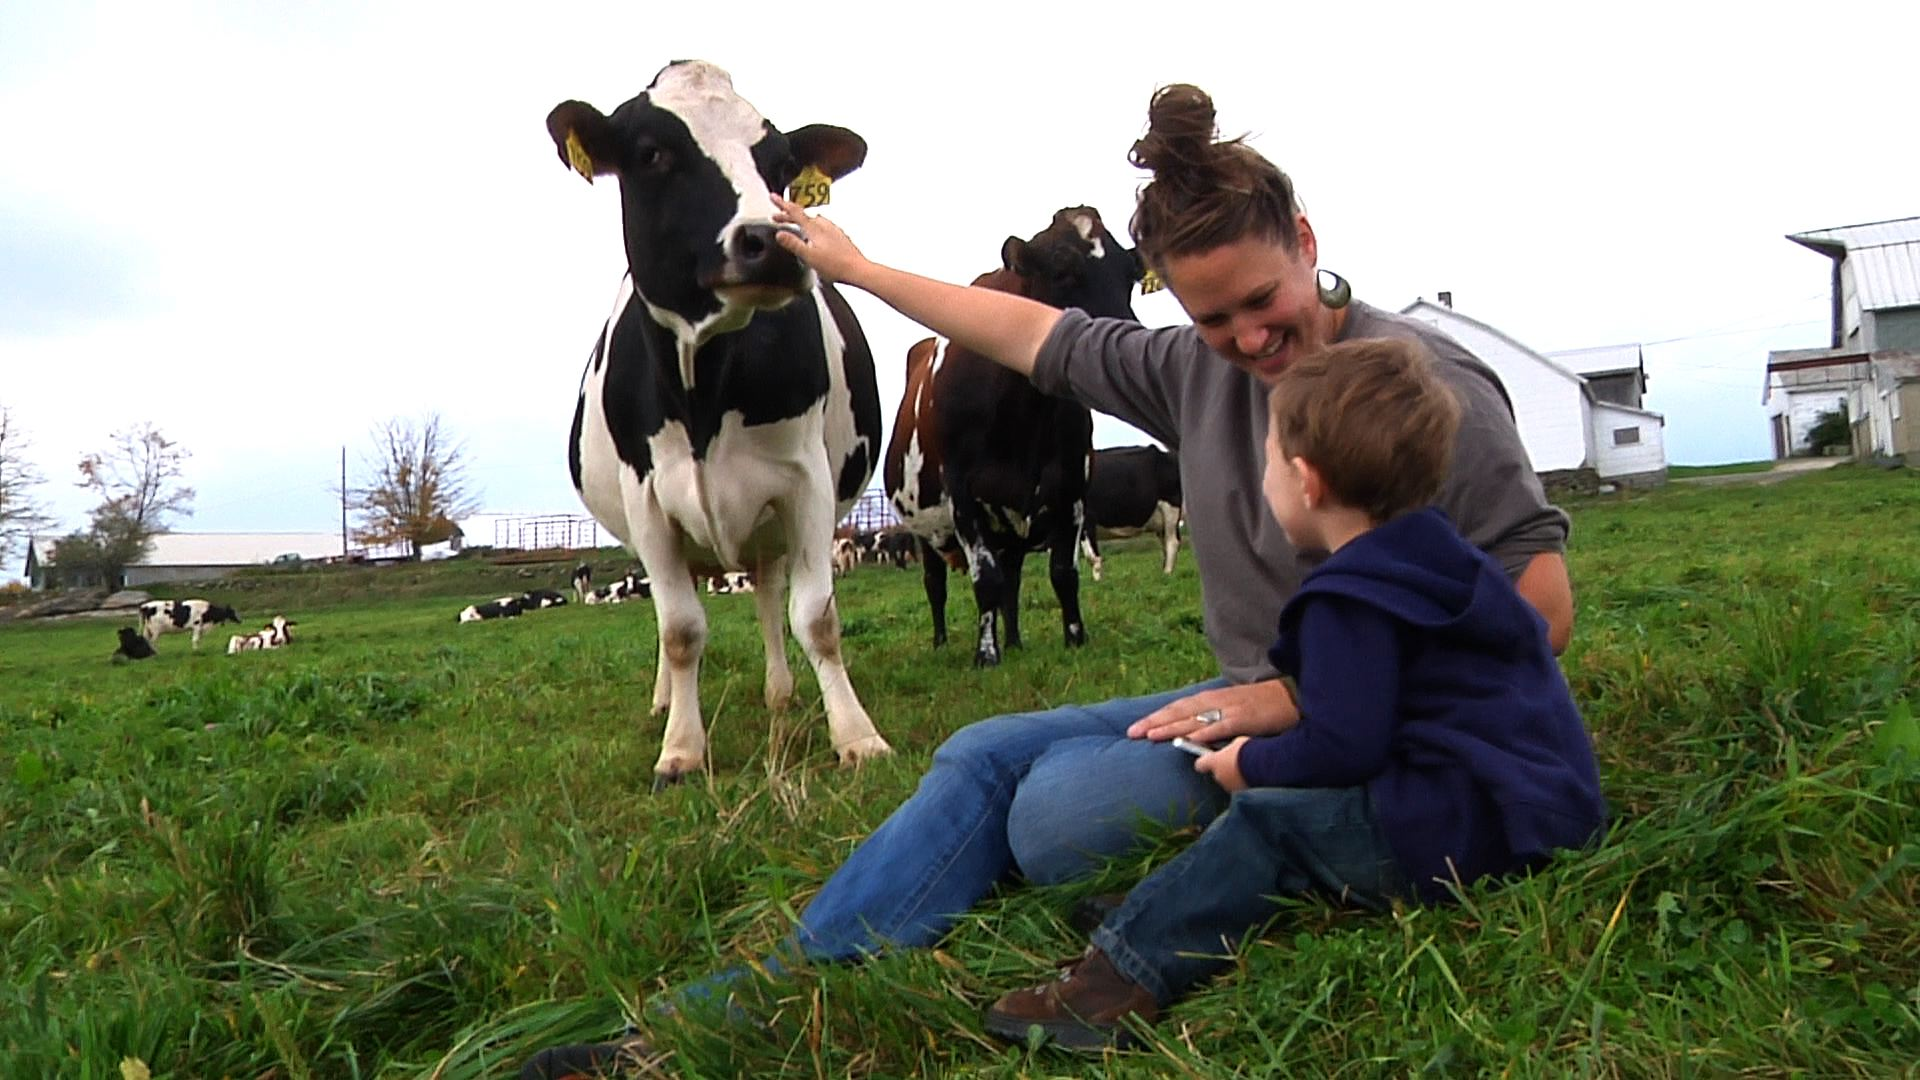 Corse Family Farm - Saying hello to the cows